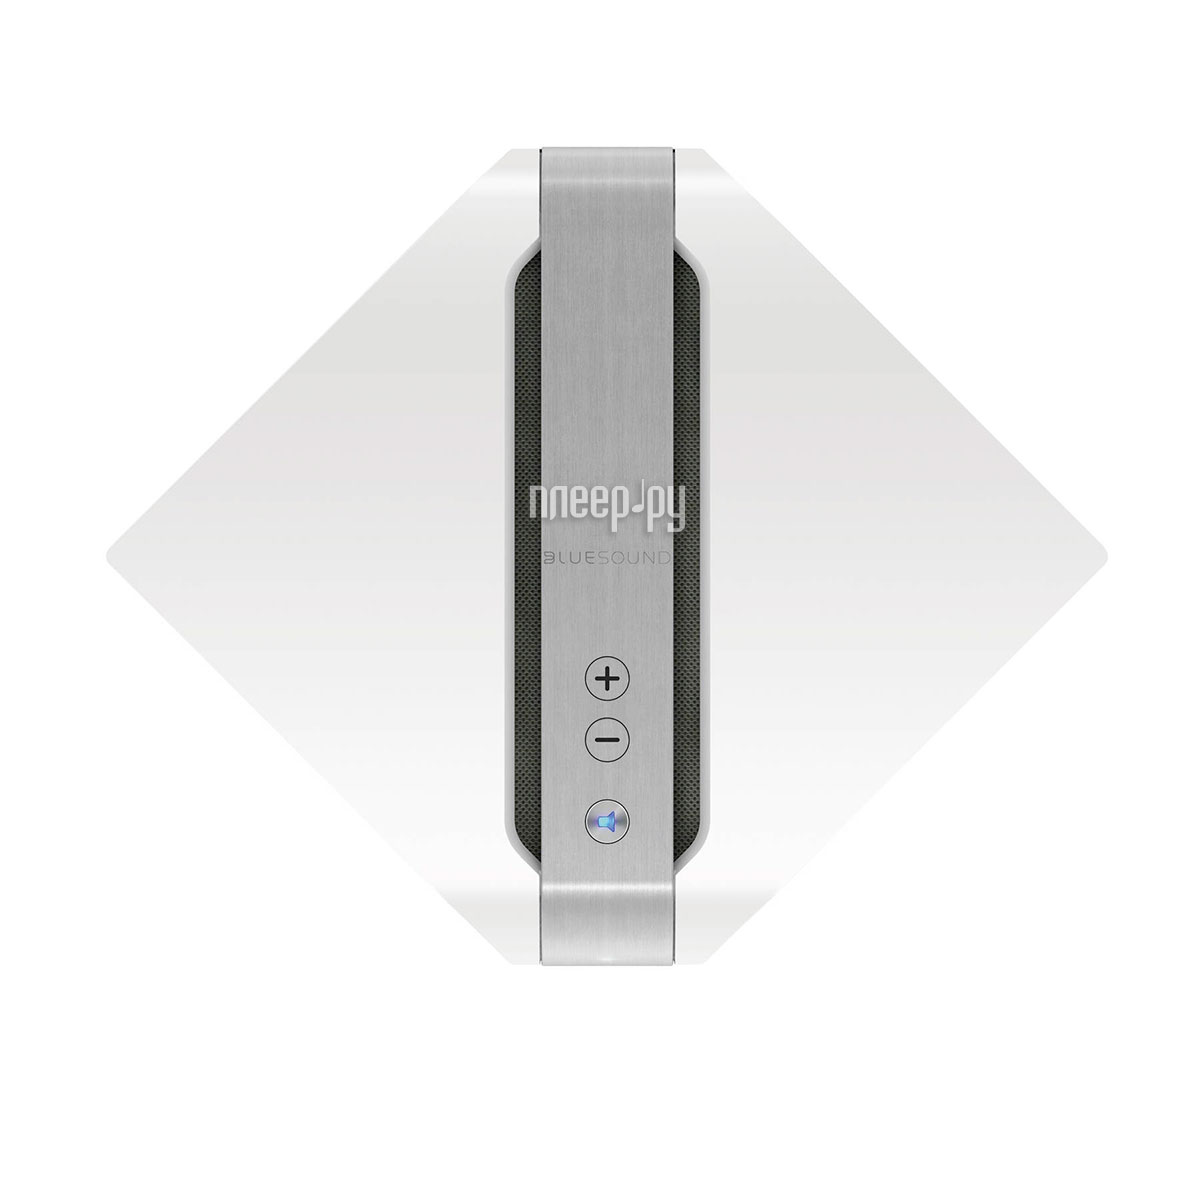 Медиаплеер Bluesound Powernode N150 Gloss White